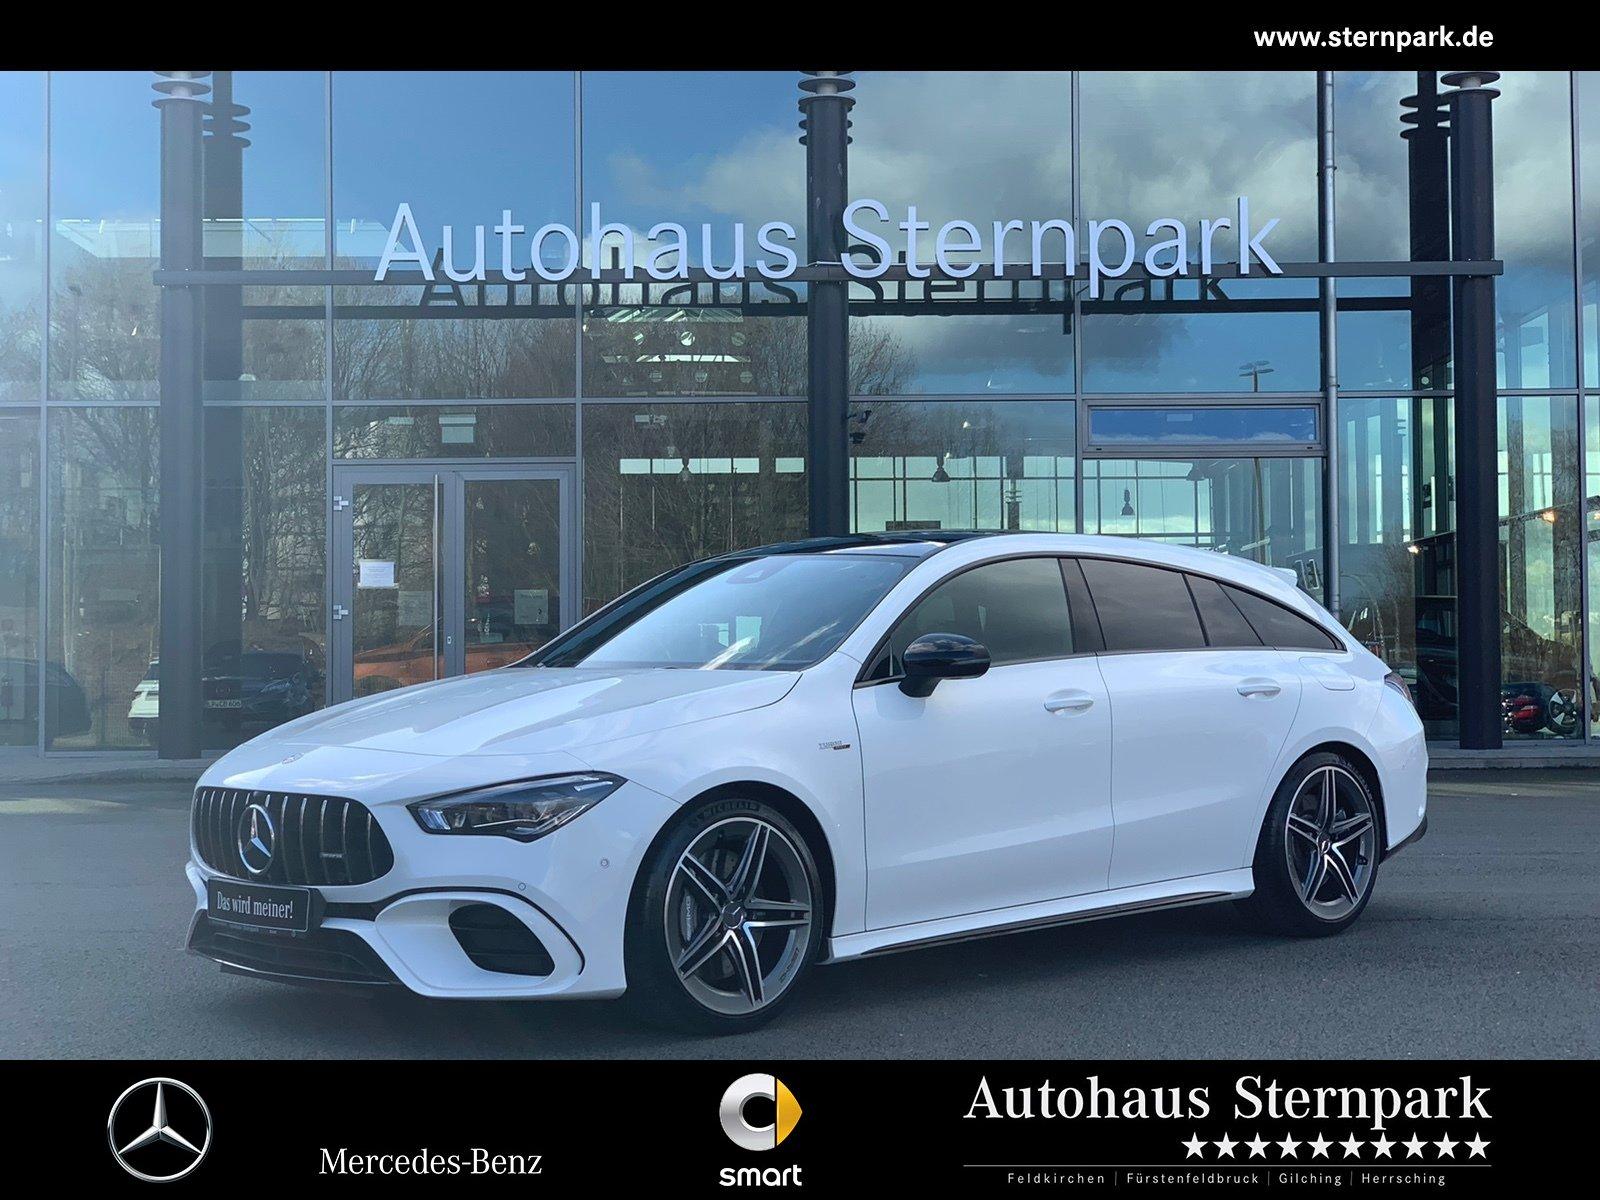 Mercedes-Benz CLA 45 AMG SB 4M+ MBUX+Pano+LED+Night+Kamera+uvm, Jahr 2019, Benzin